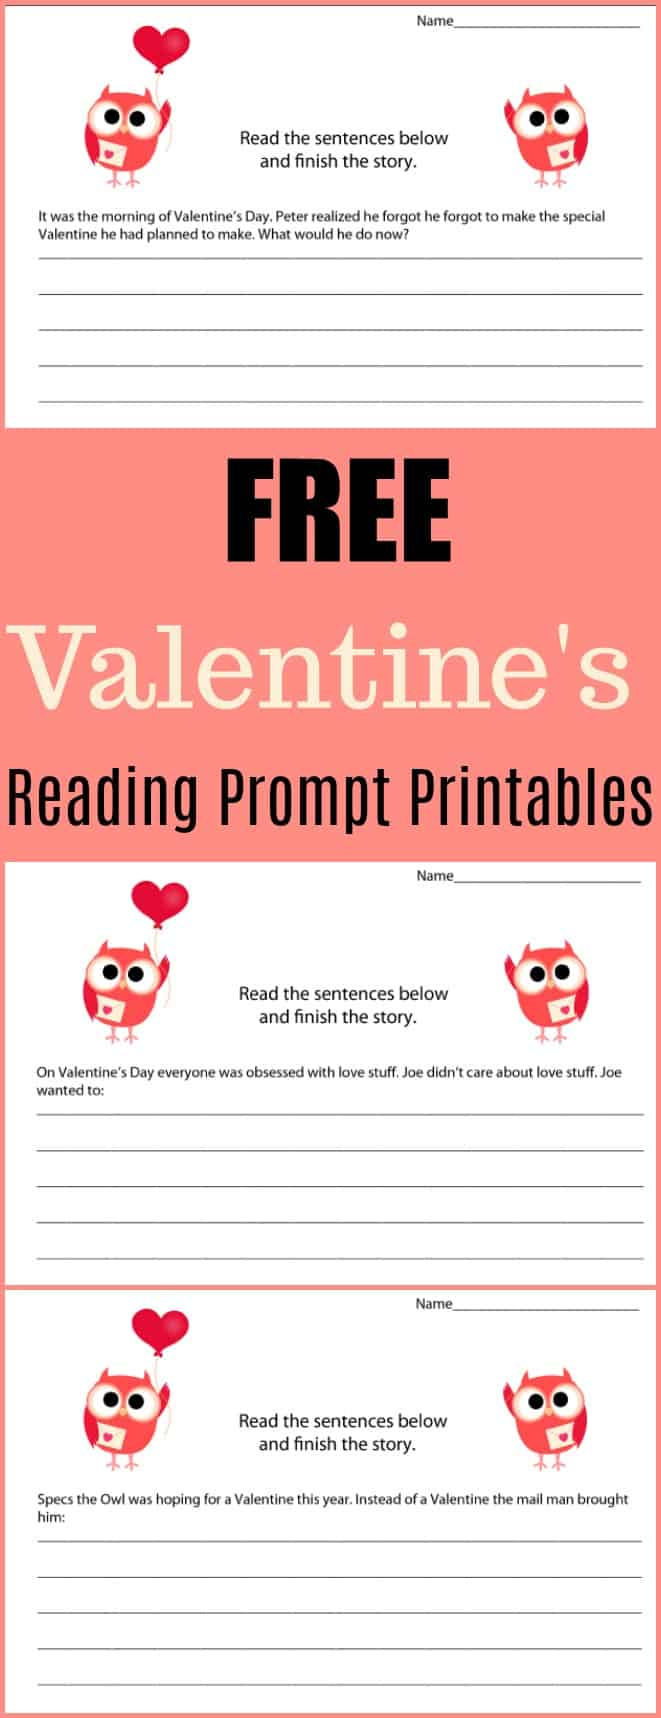 Free Valentine's Writing Prompt Printables